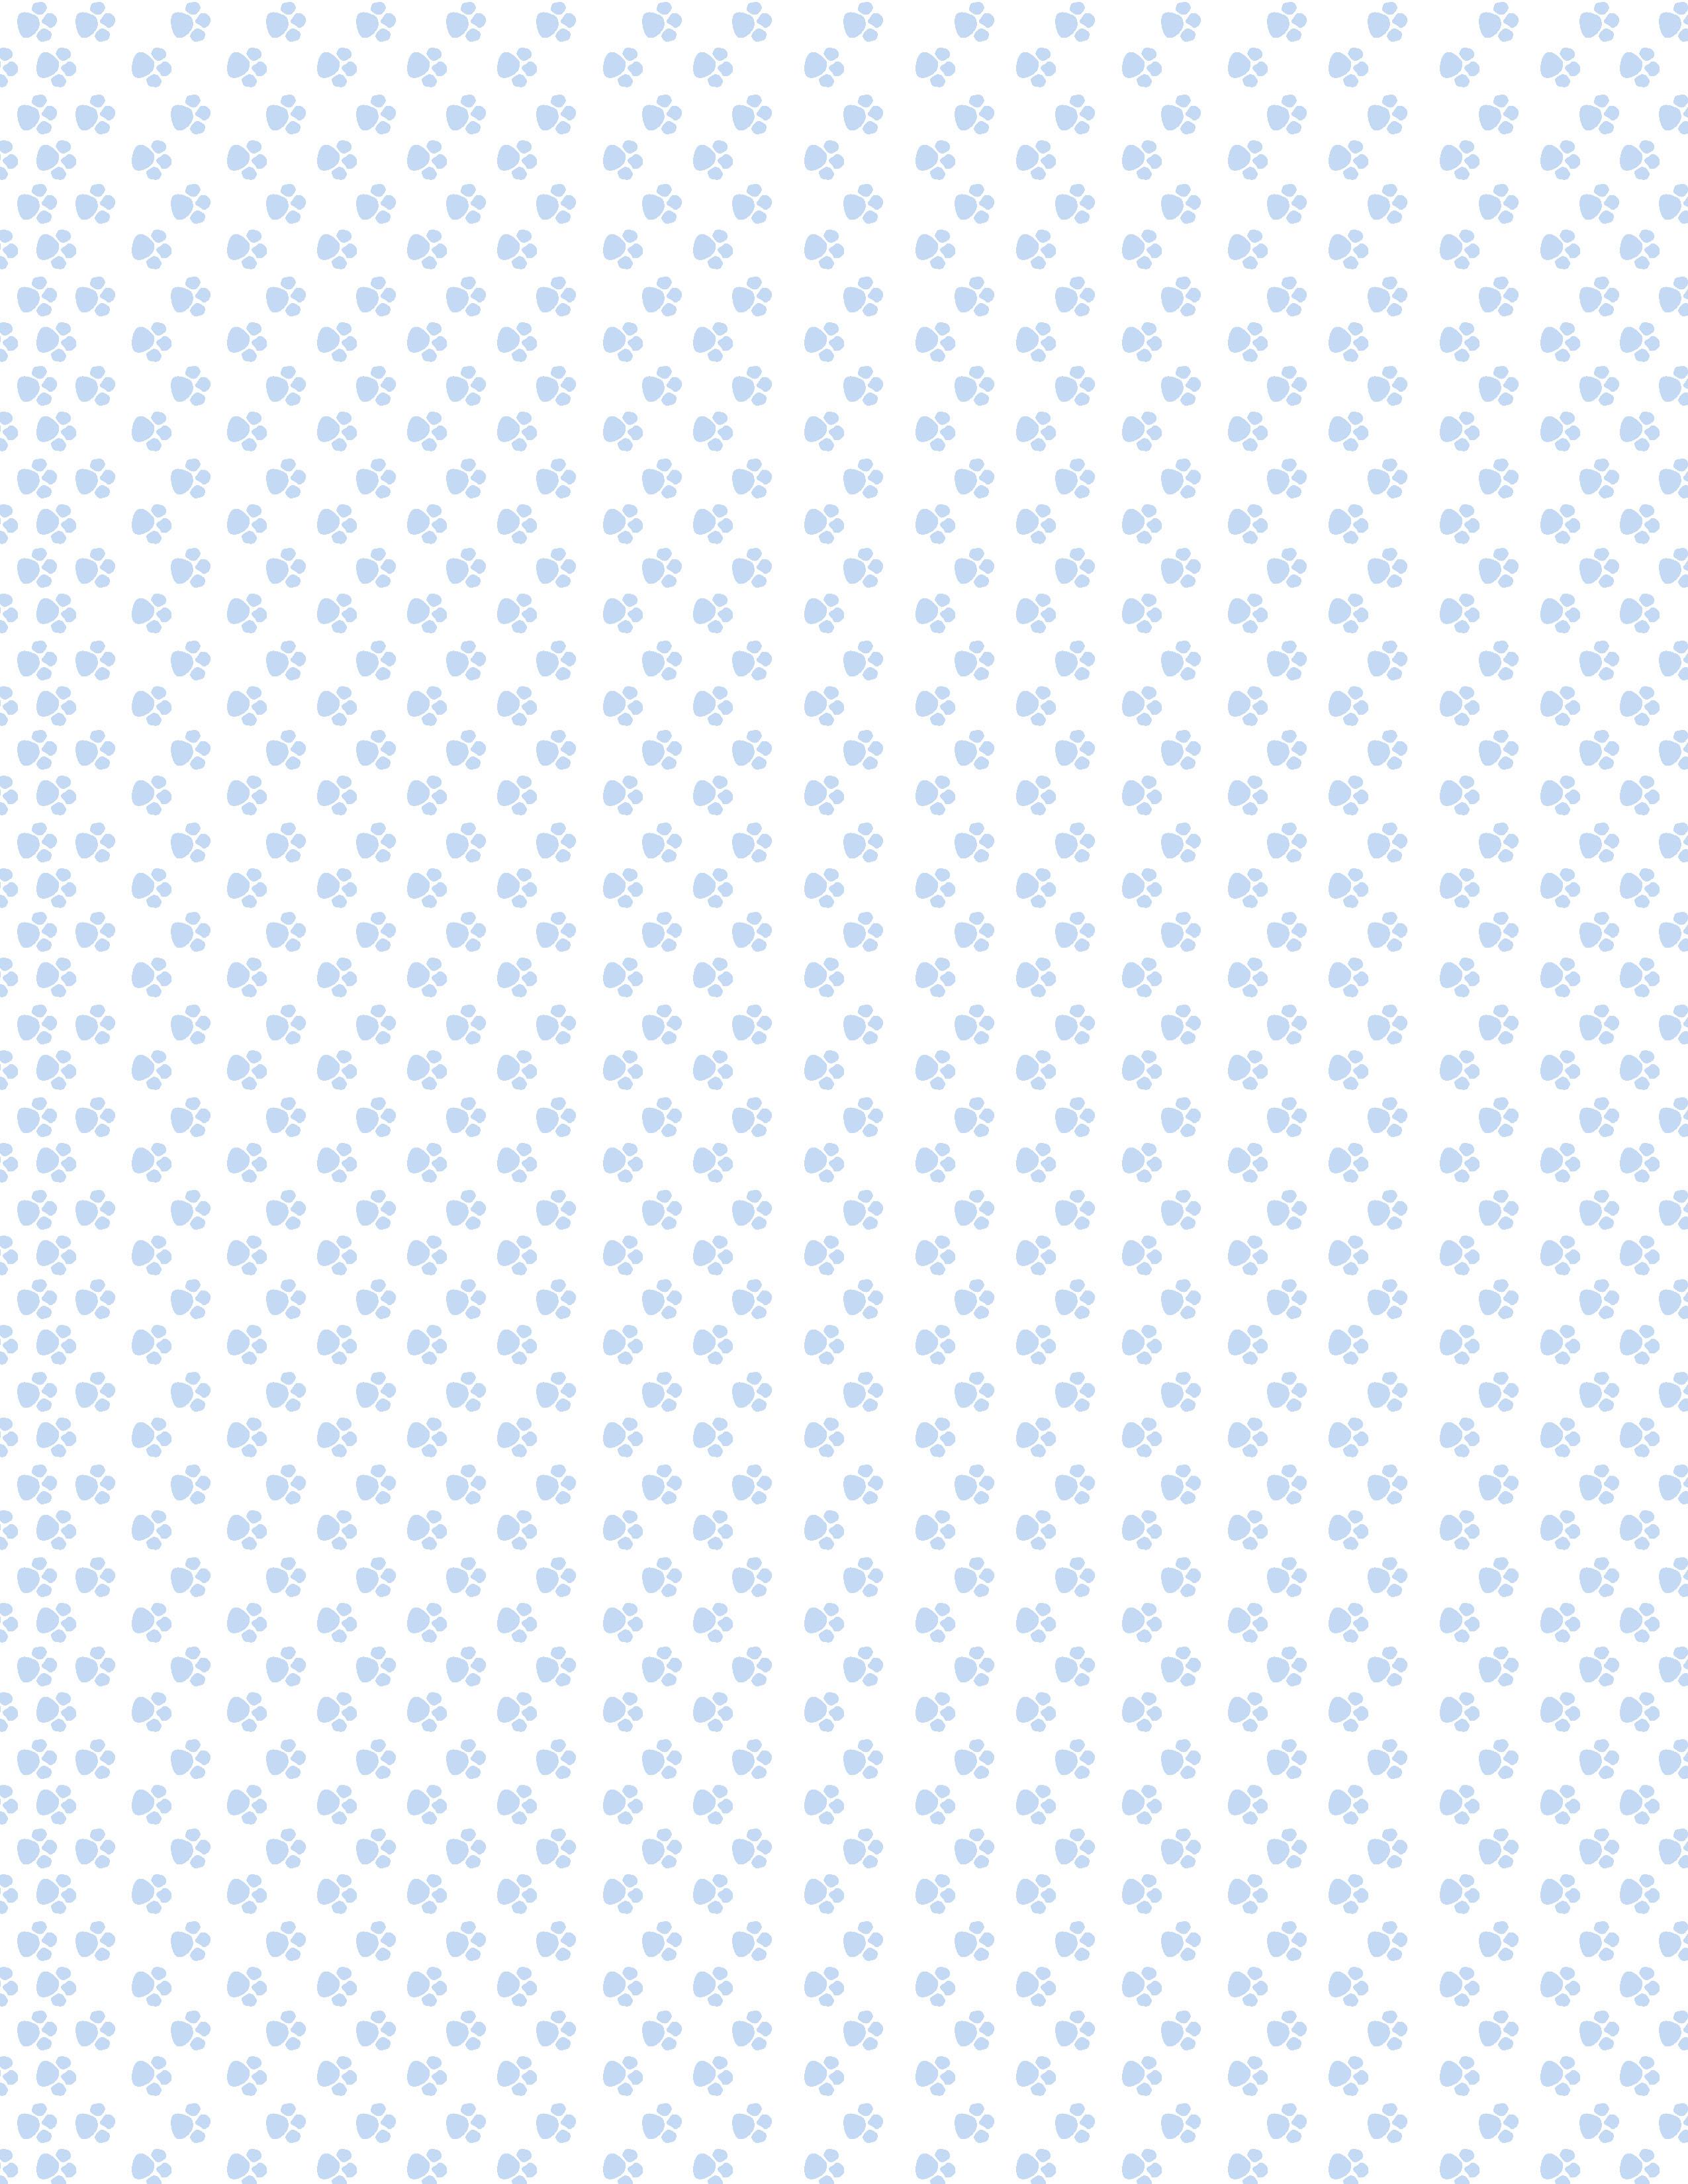 Paw Prints Light Blue Backgroundedited 1